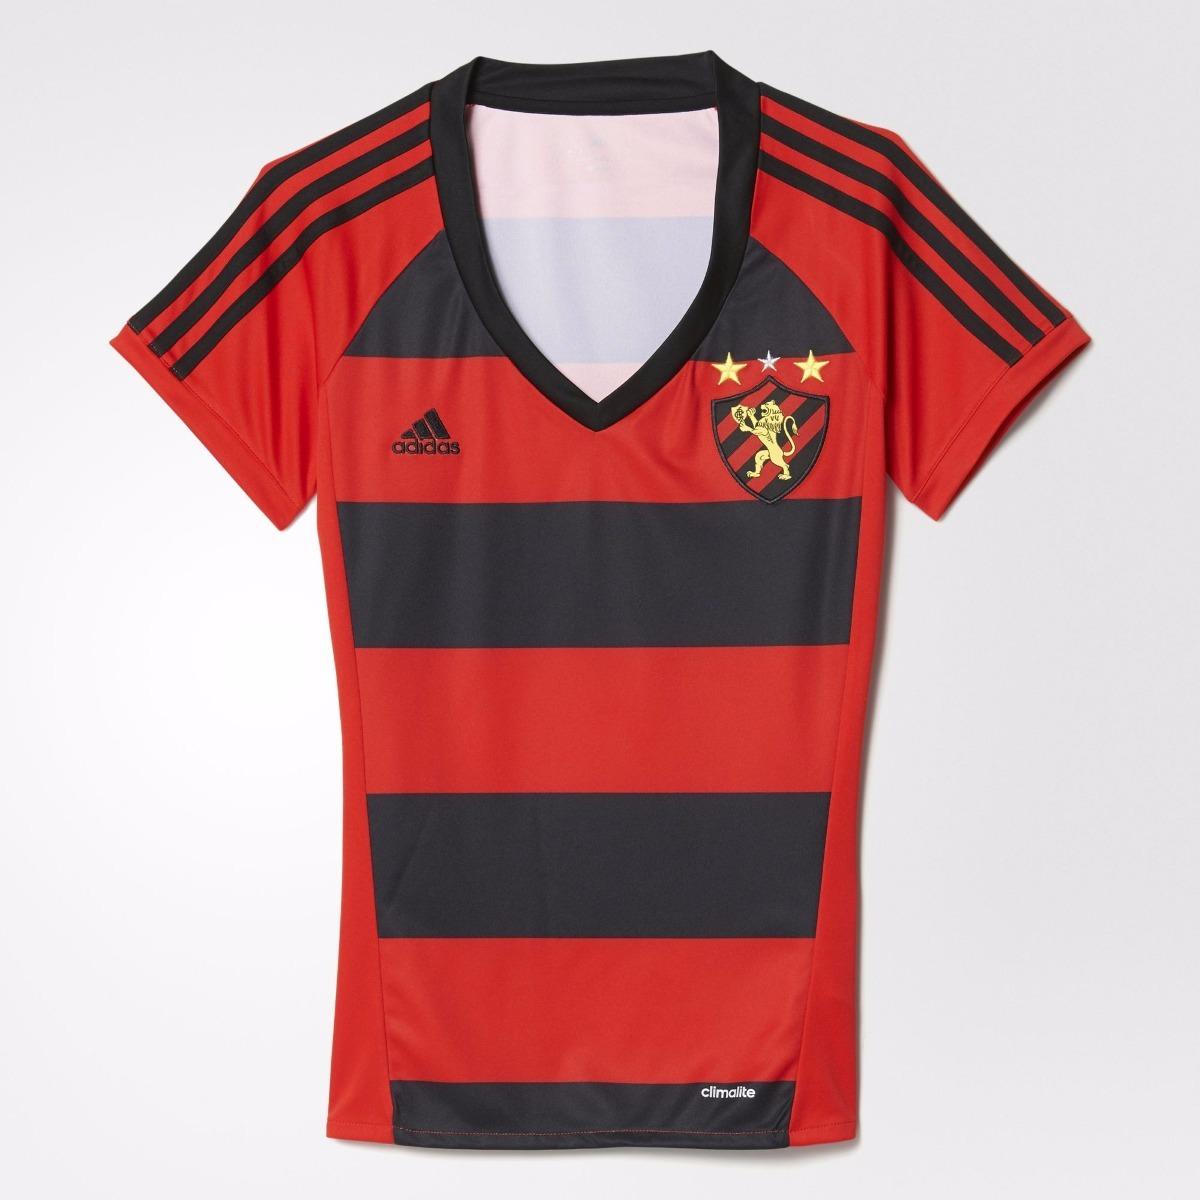 631251aa8d camisa adidas sport recife 1 feminina tam. gg. Carregando zoom.